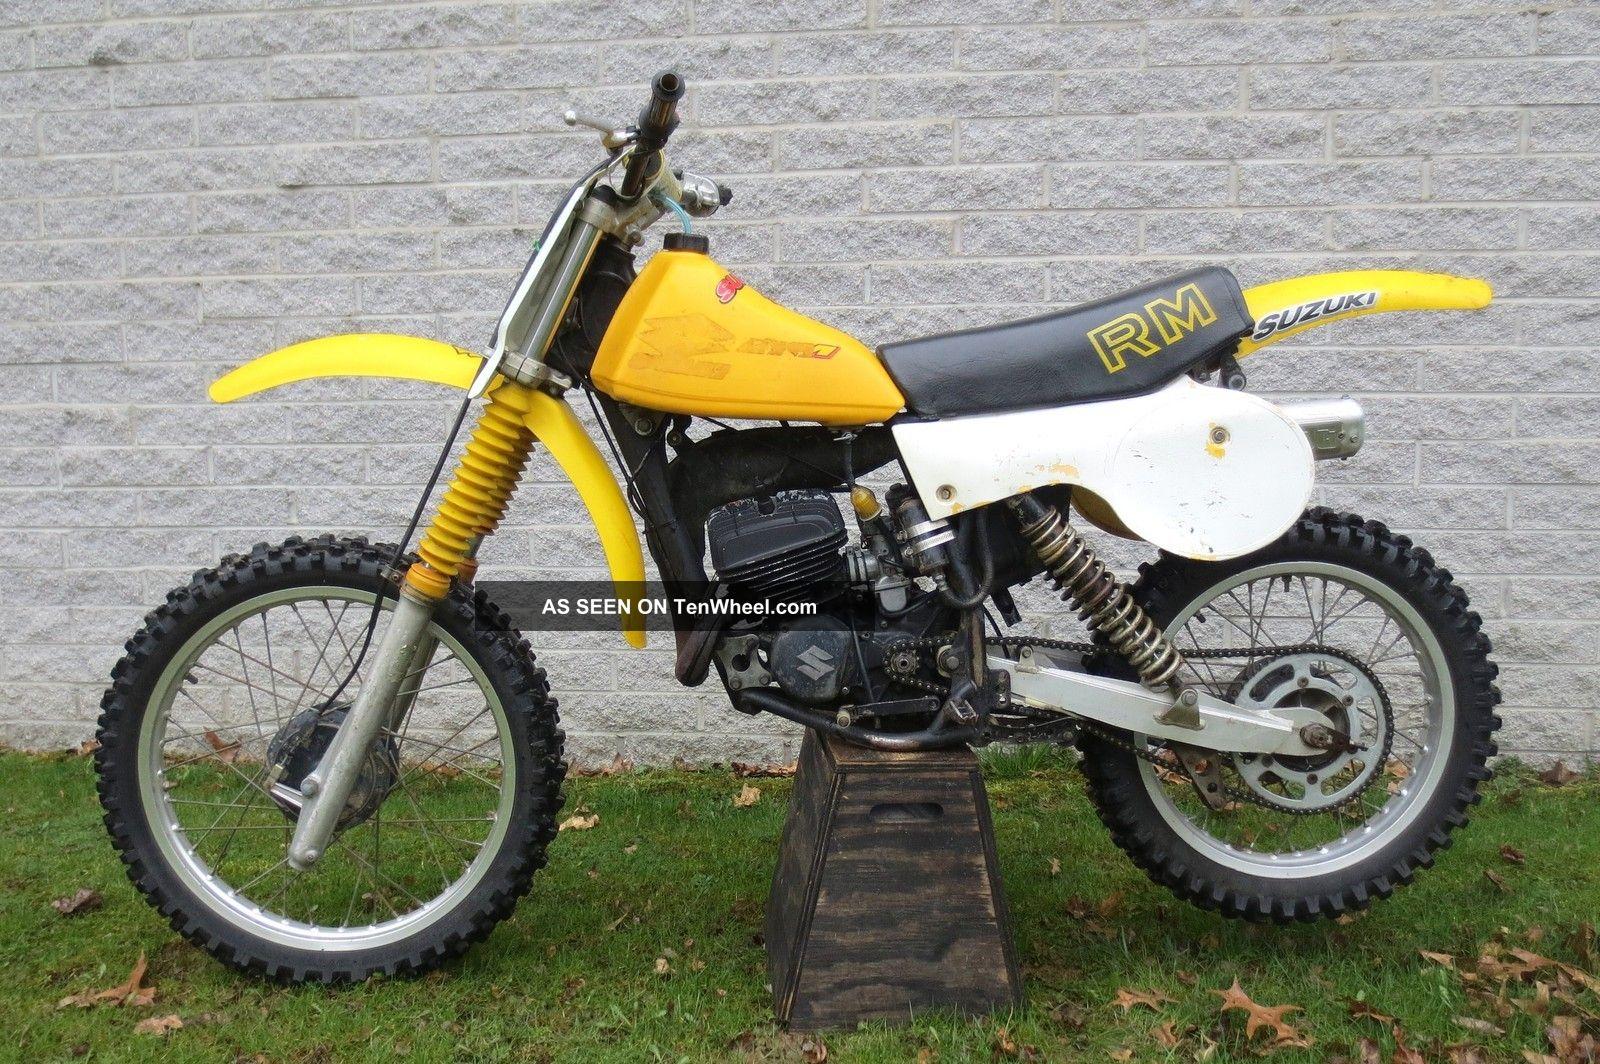 1979 Suzuki Rm125 Motocross Racer Trail Bike Ready To Ride RM photo